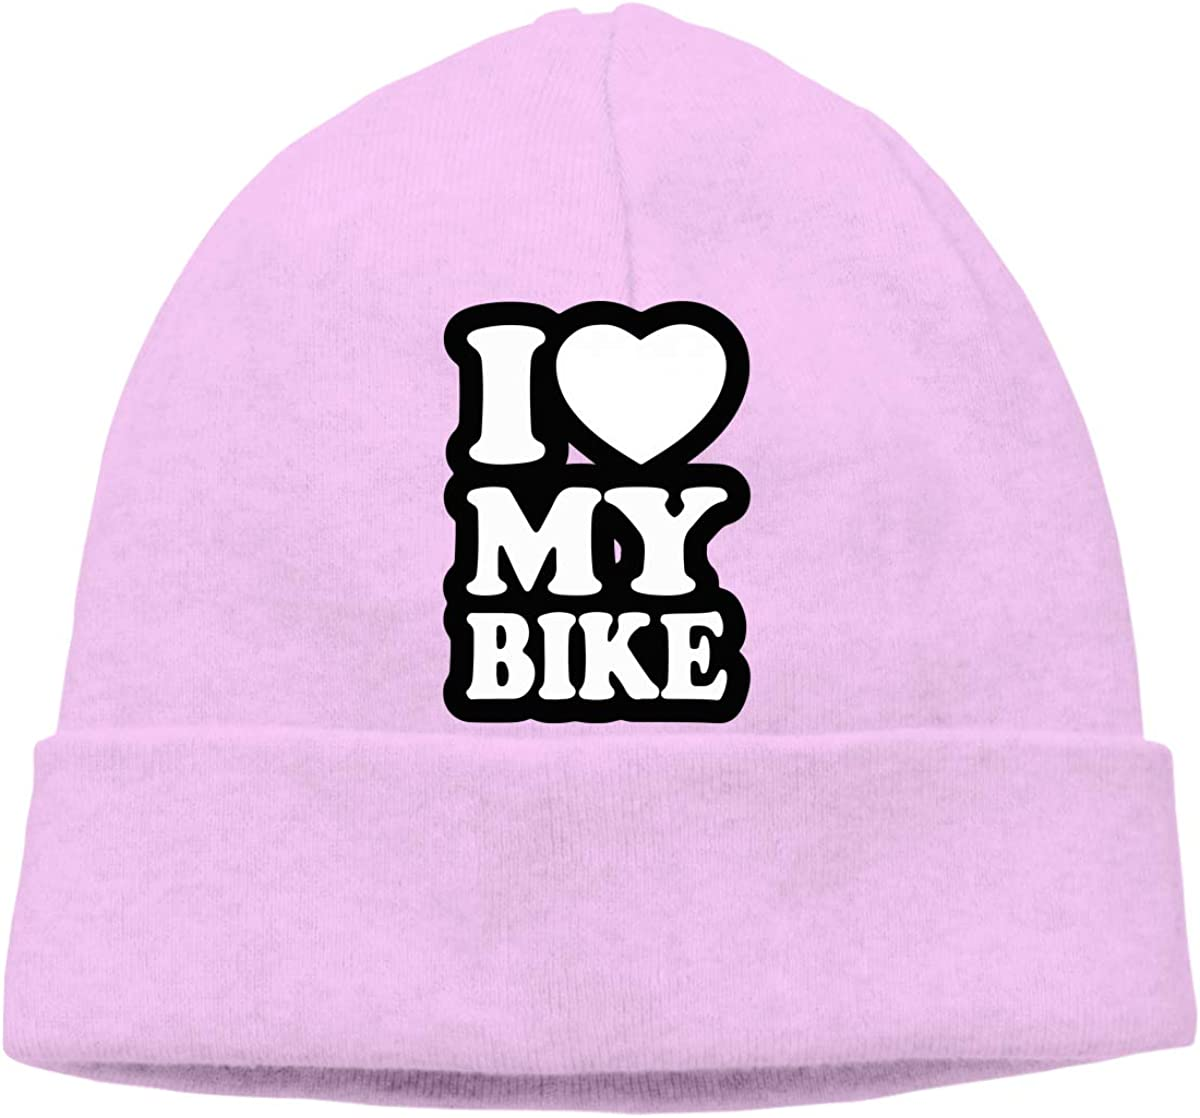 Unisex I Love My Bike Soft Knit Beanie Caps Soft Hat